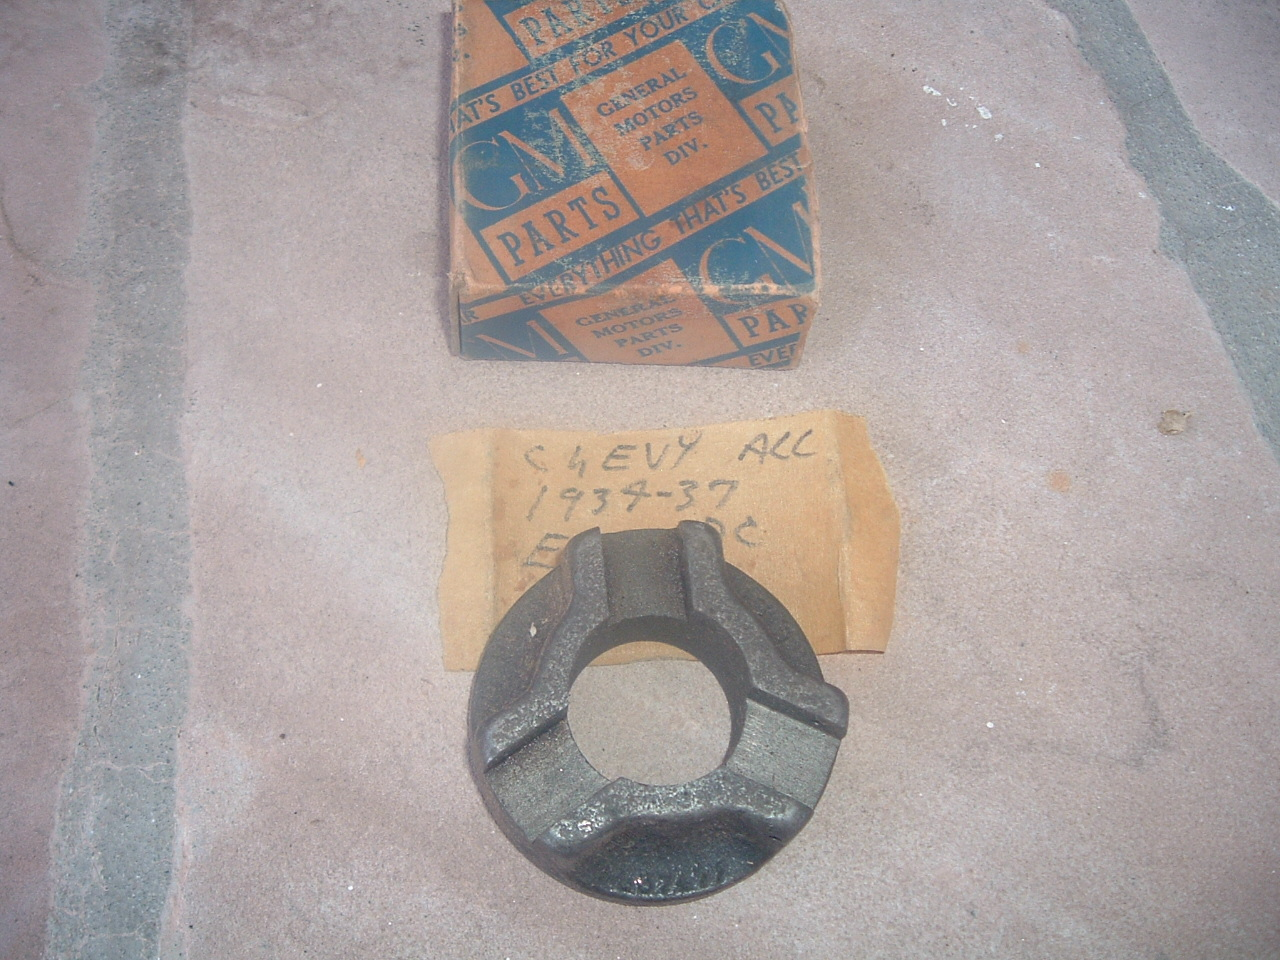 Transmission Shifter Gears